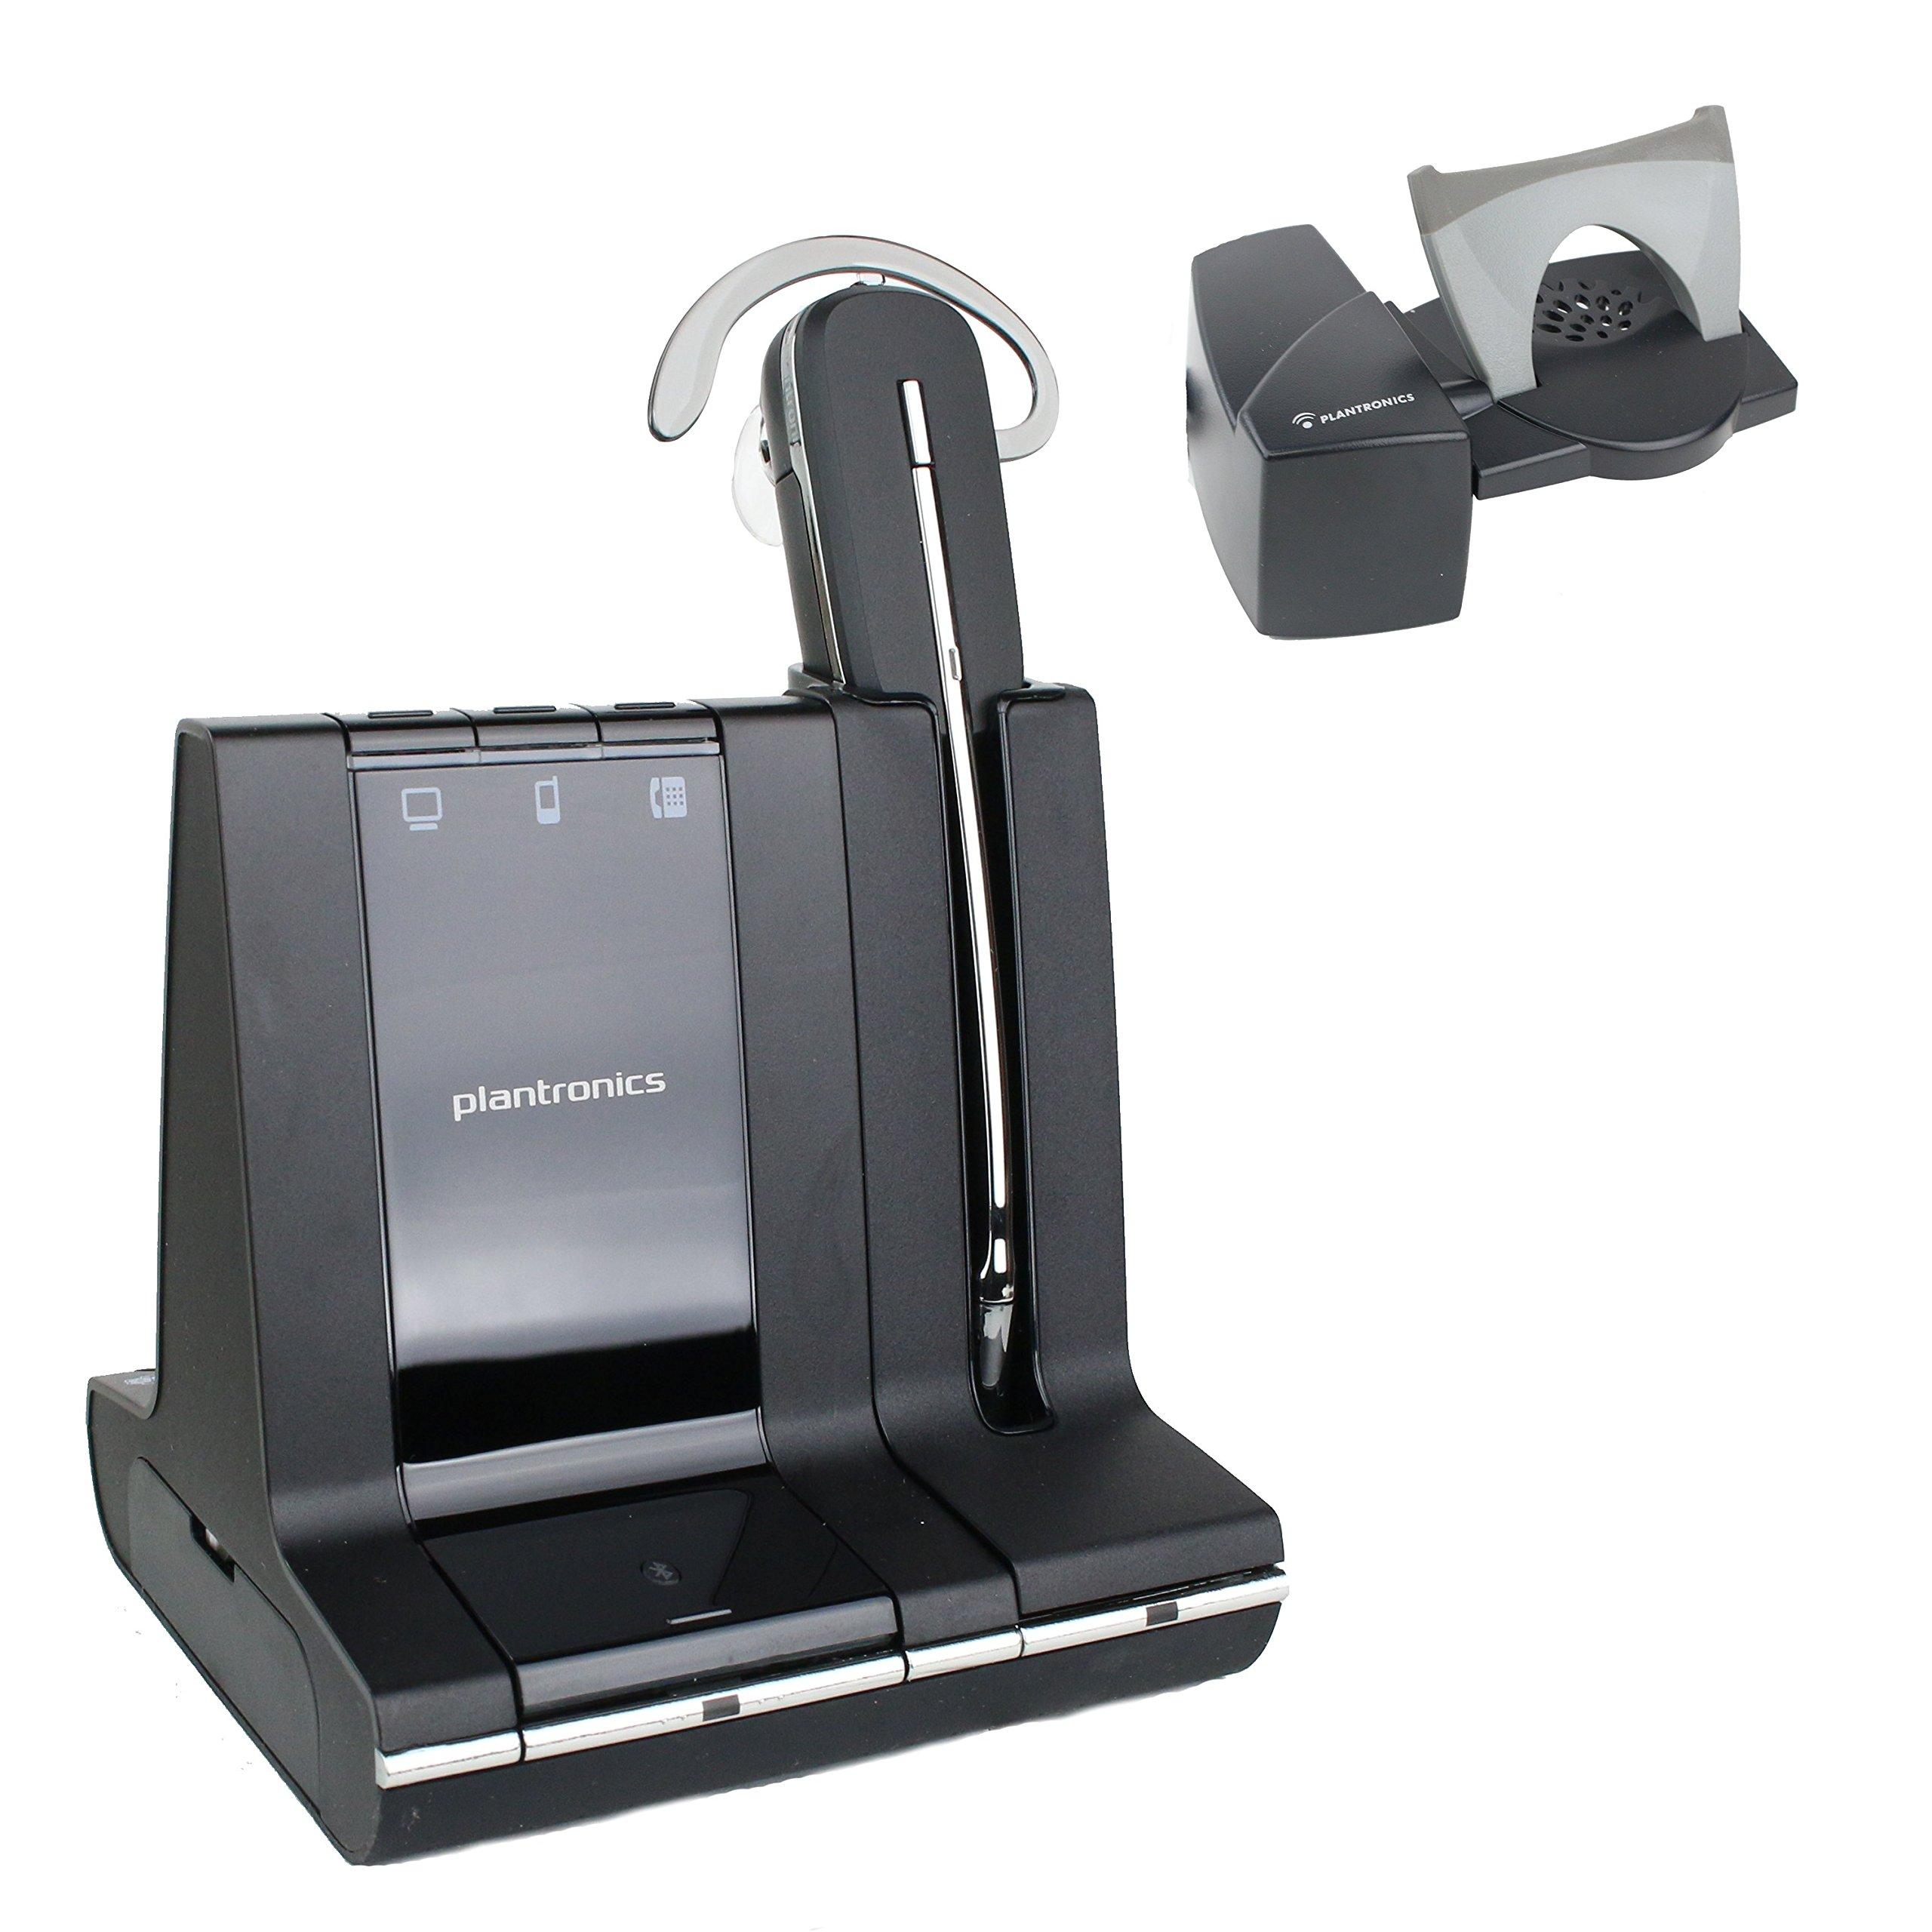 Plantronics Savi W740 Wireless Office Headset System With Lifter (Certified Refurbished)